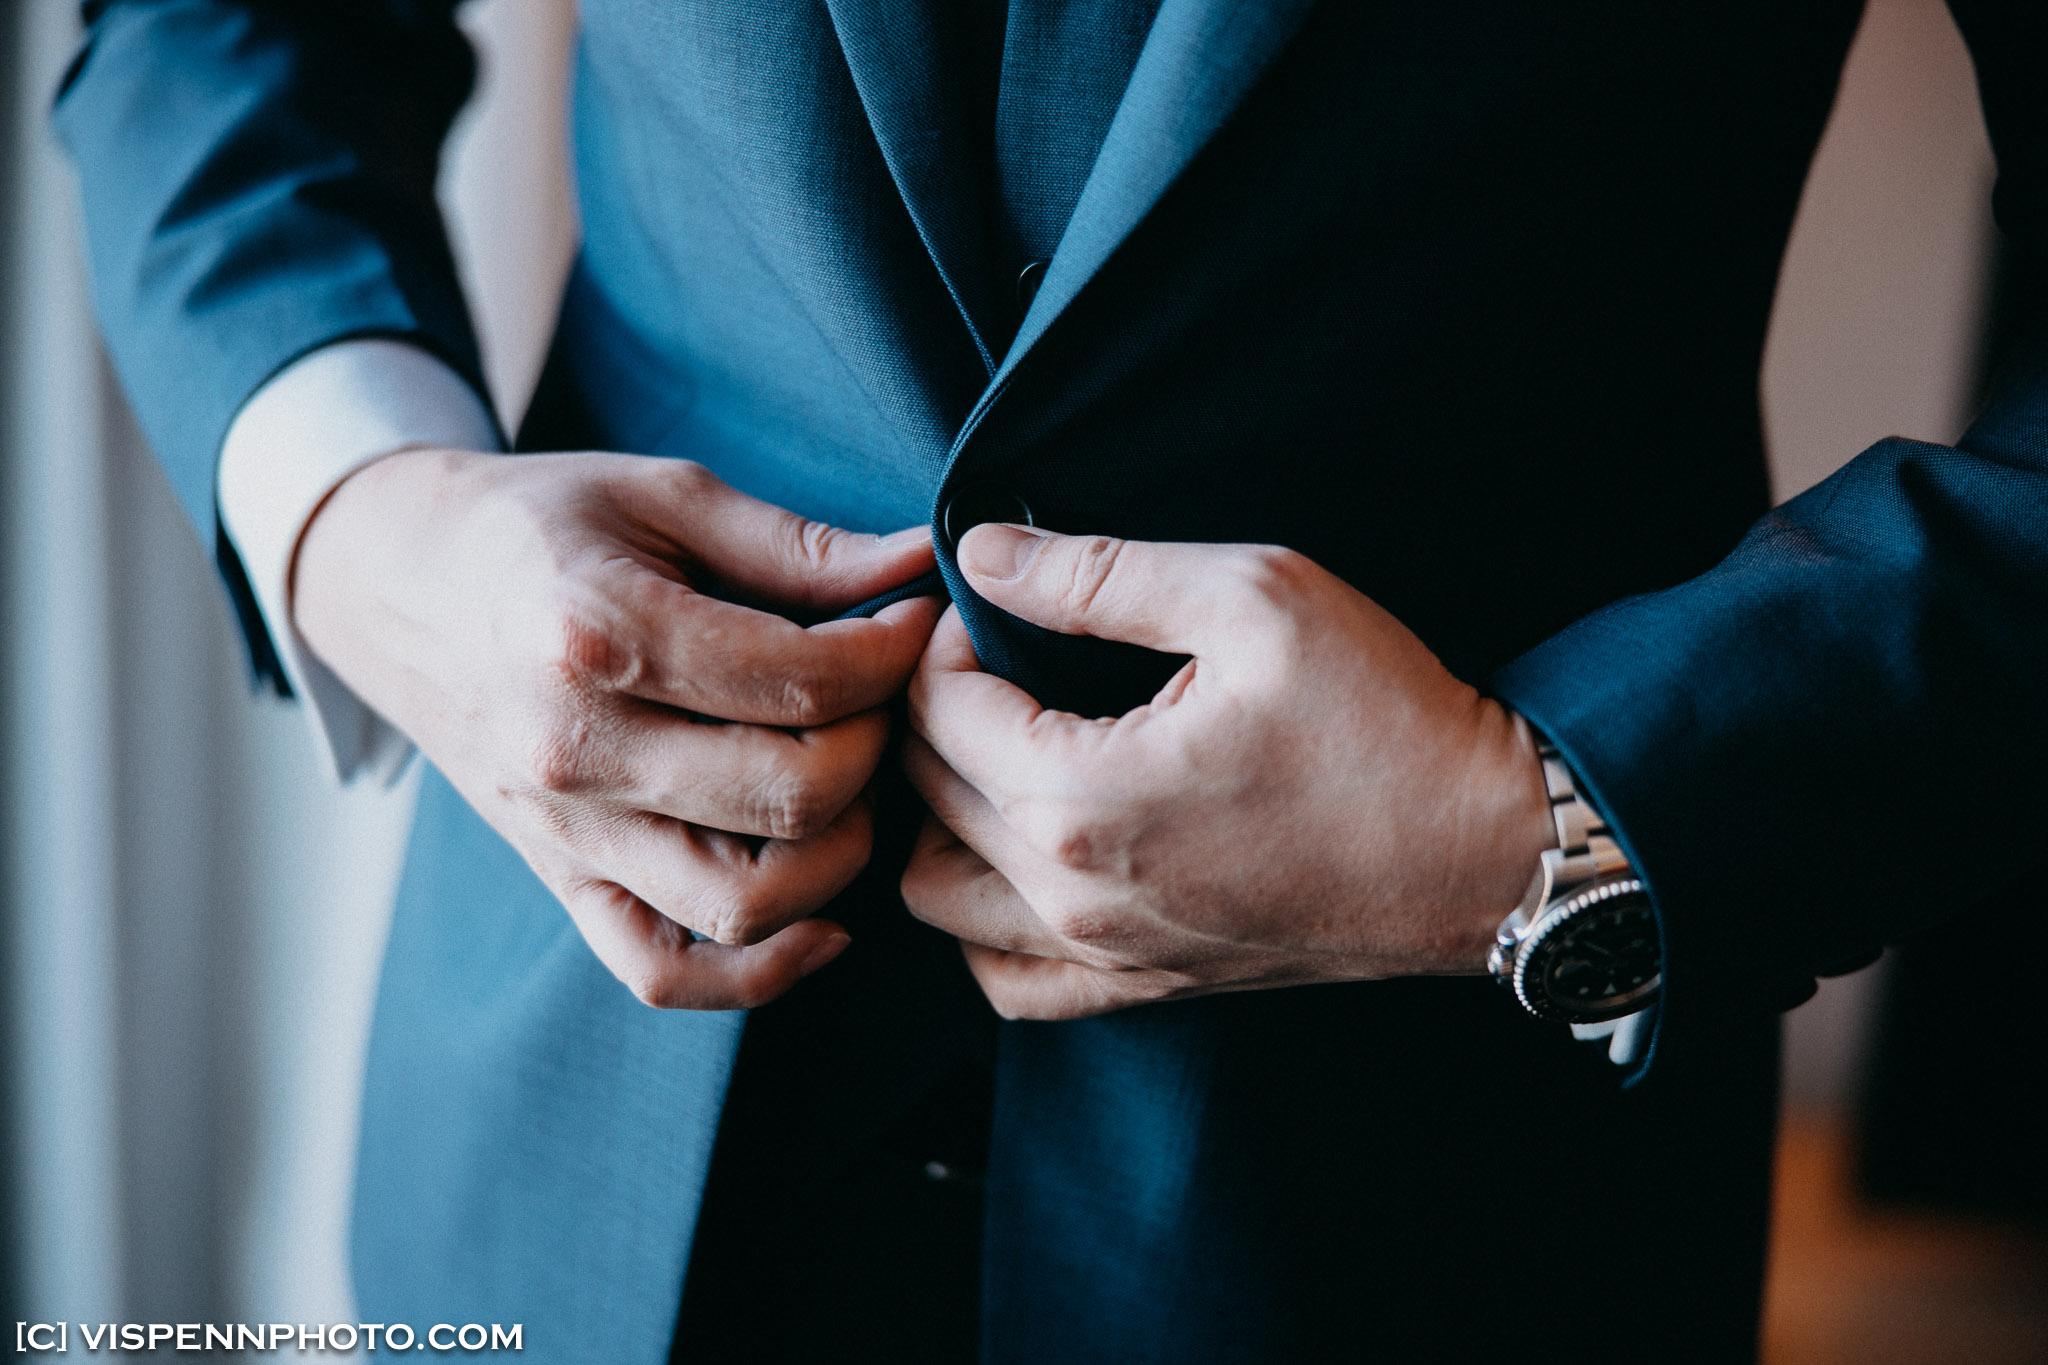 WEDDING DAY Photography Melbourne VISPENN 墨尔本 婚礼跟拍 婚礼摄像 婚礼摄影 结婚照 登记照 AndyIcyWED 0633 EOSR VISPENN